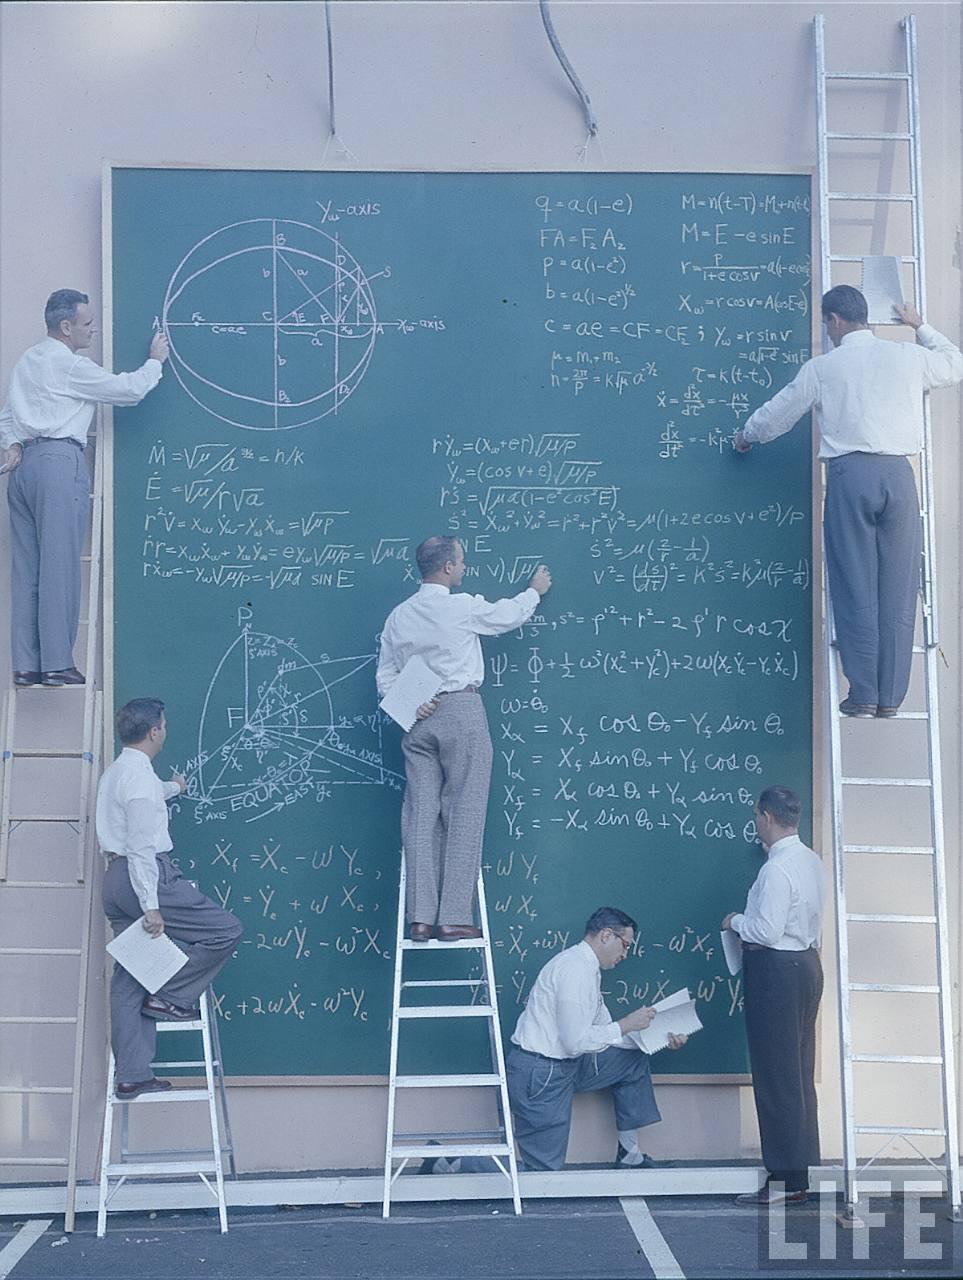 old school NASA calculations